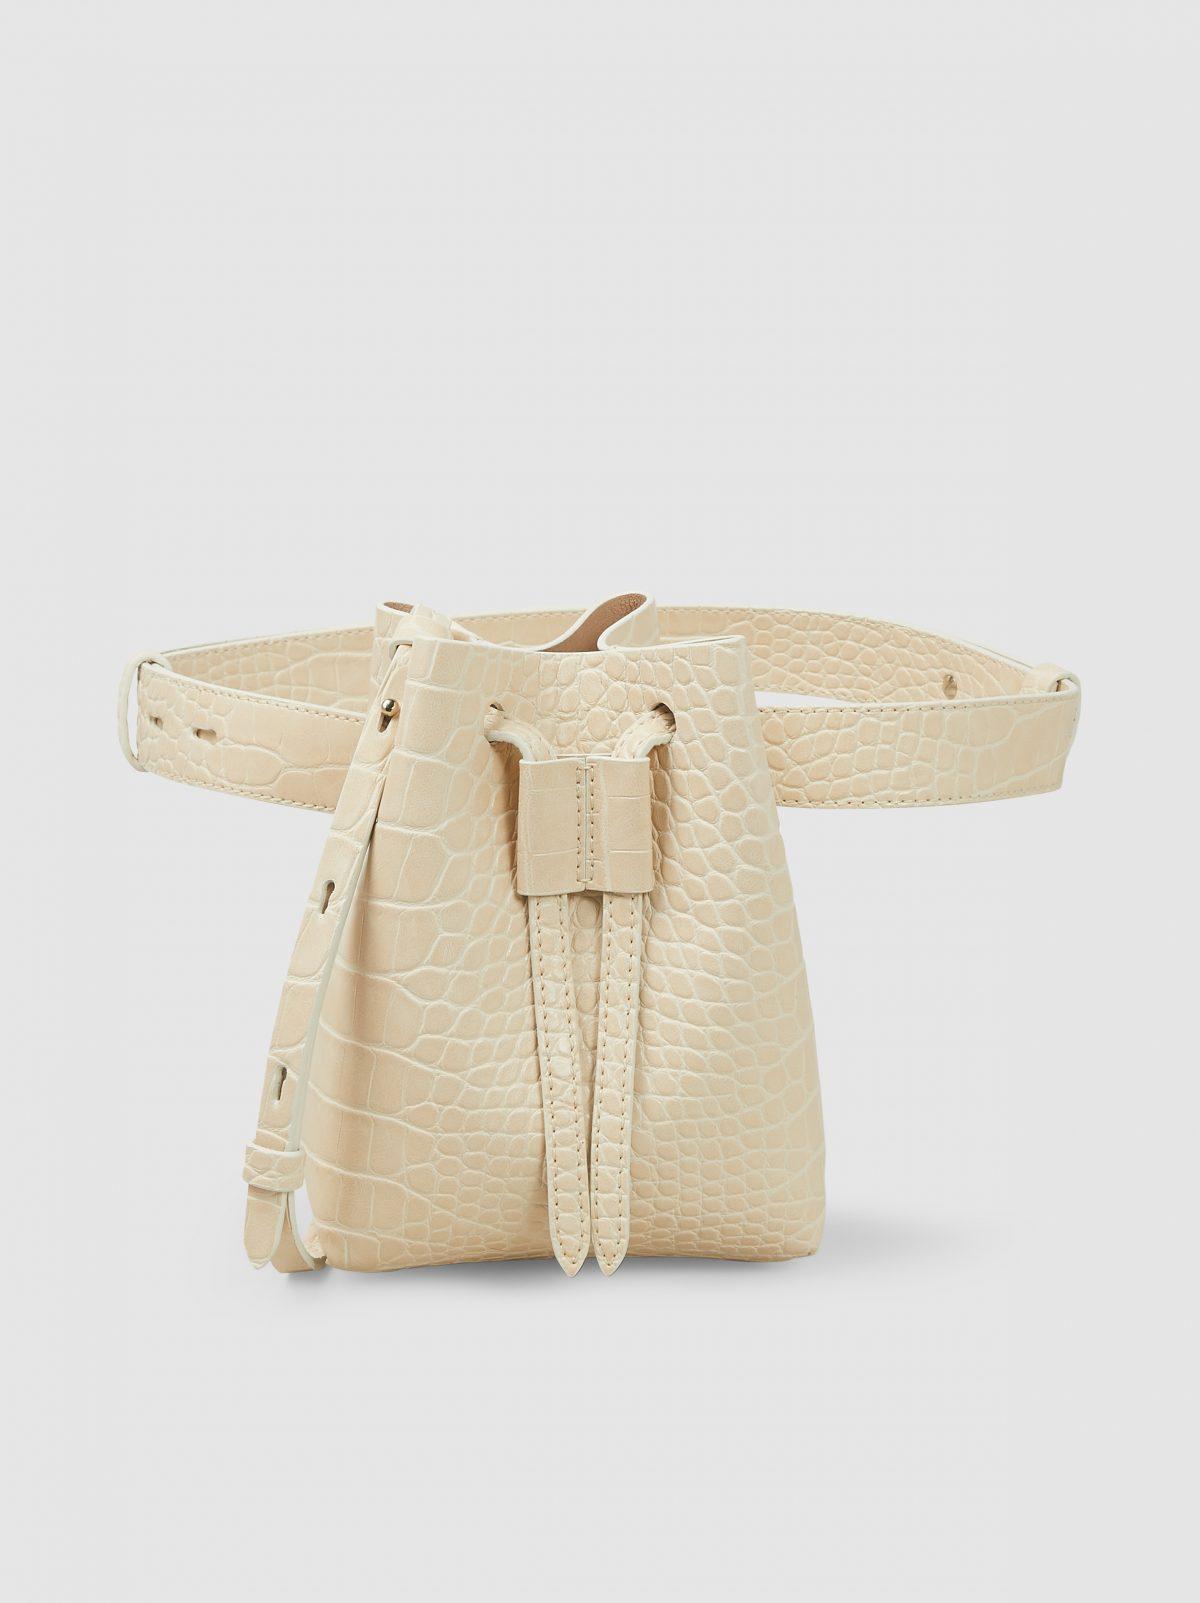 Nanushka Vegan Leather Belt Bag, Vegan Leather Bags